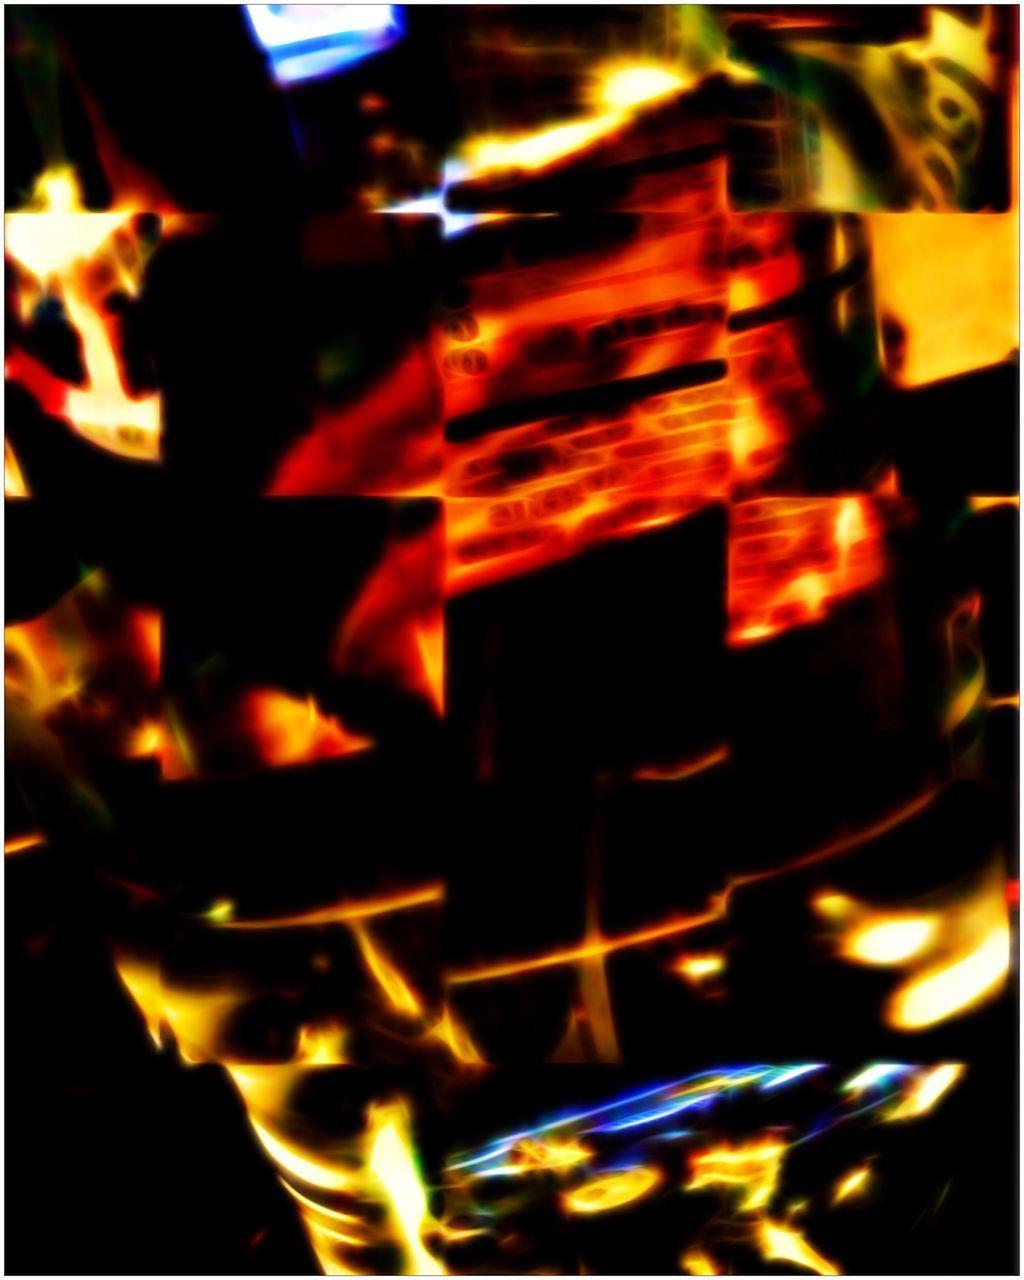 flame, burning, heat - temperature, glowing, night, close-up, illuminated, indoors, no people, motion